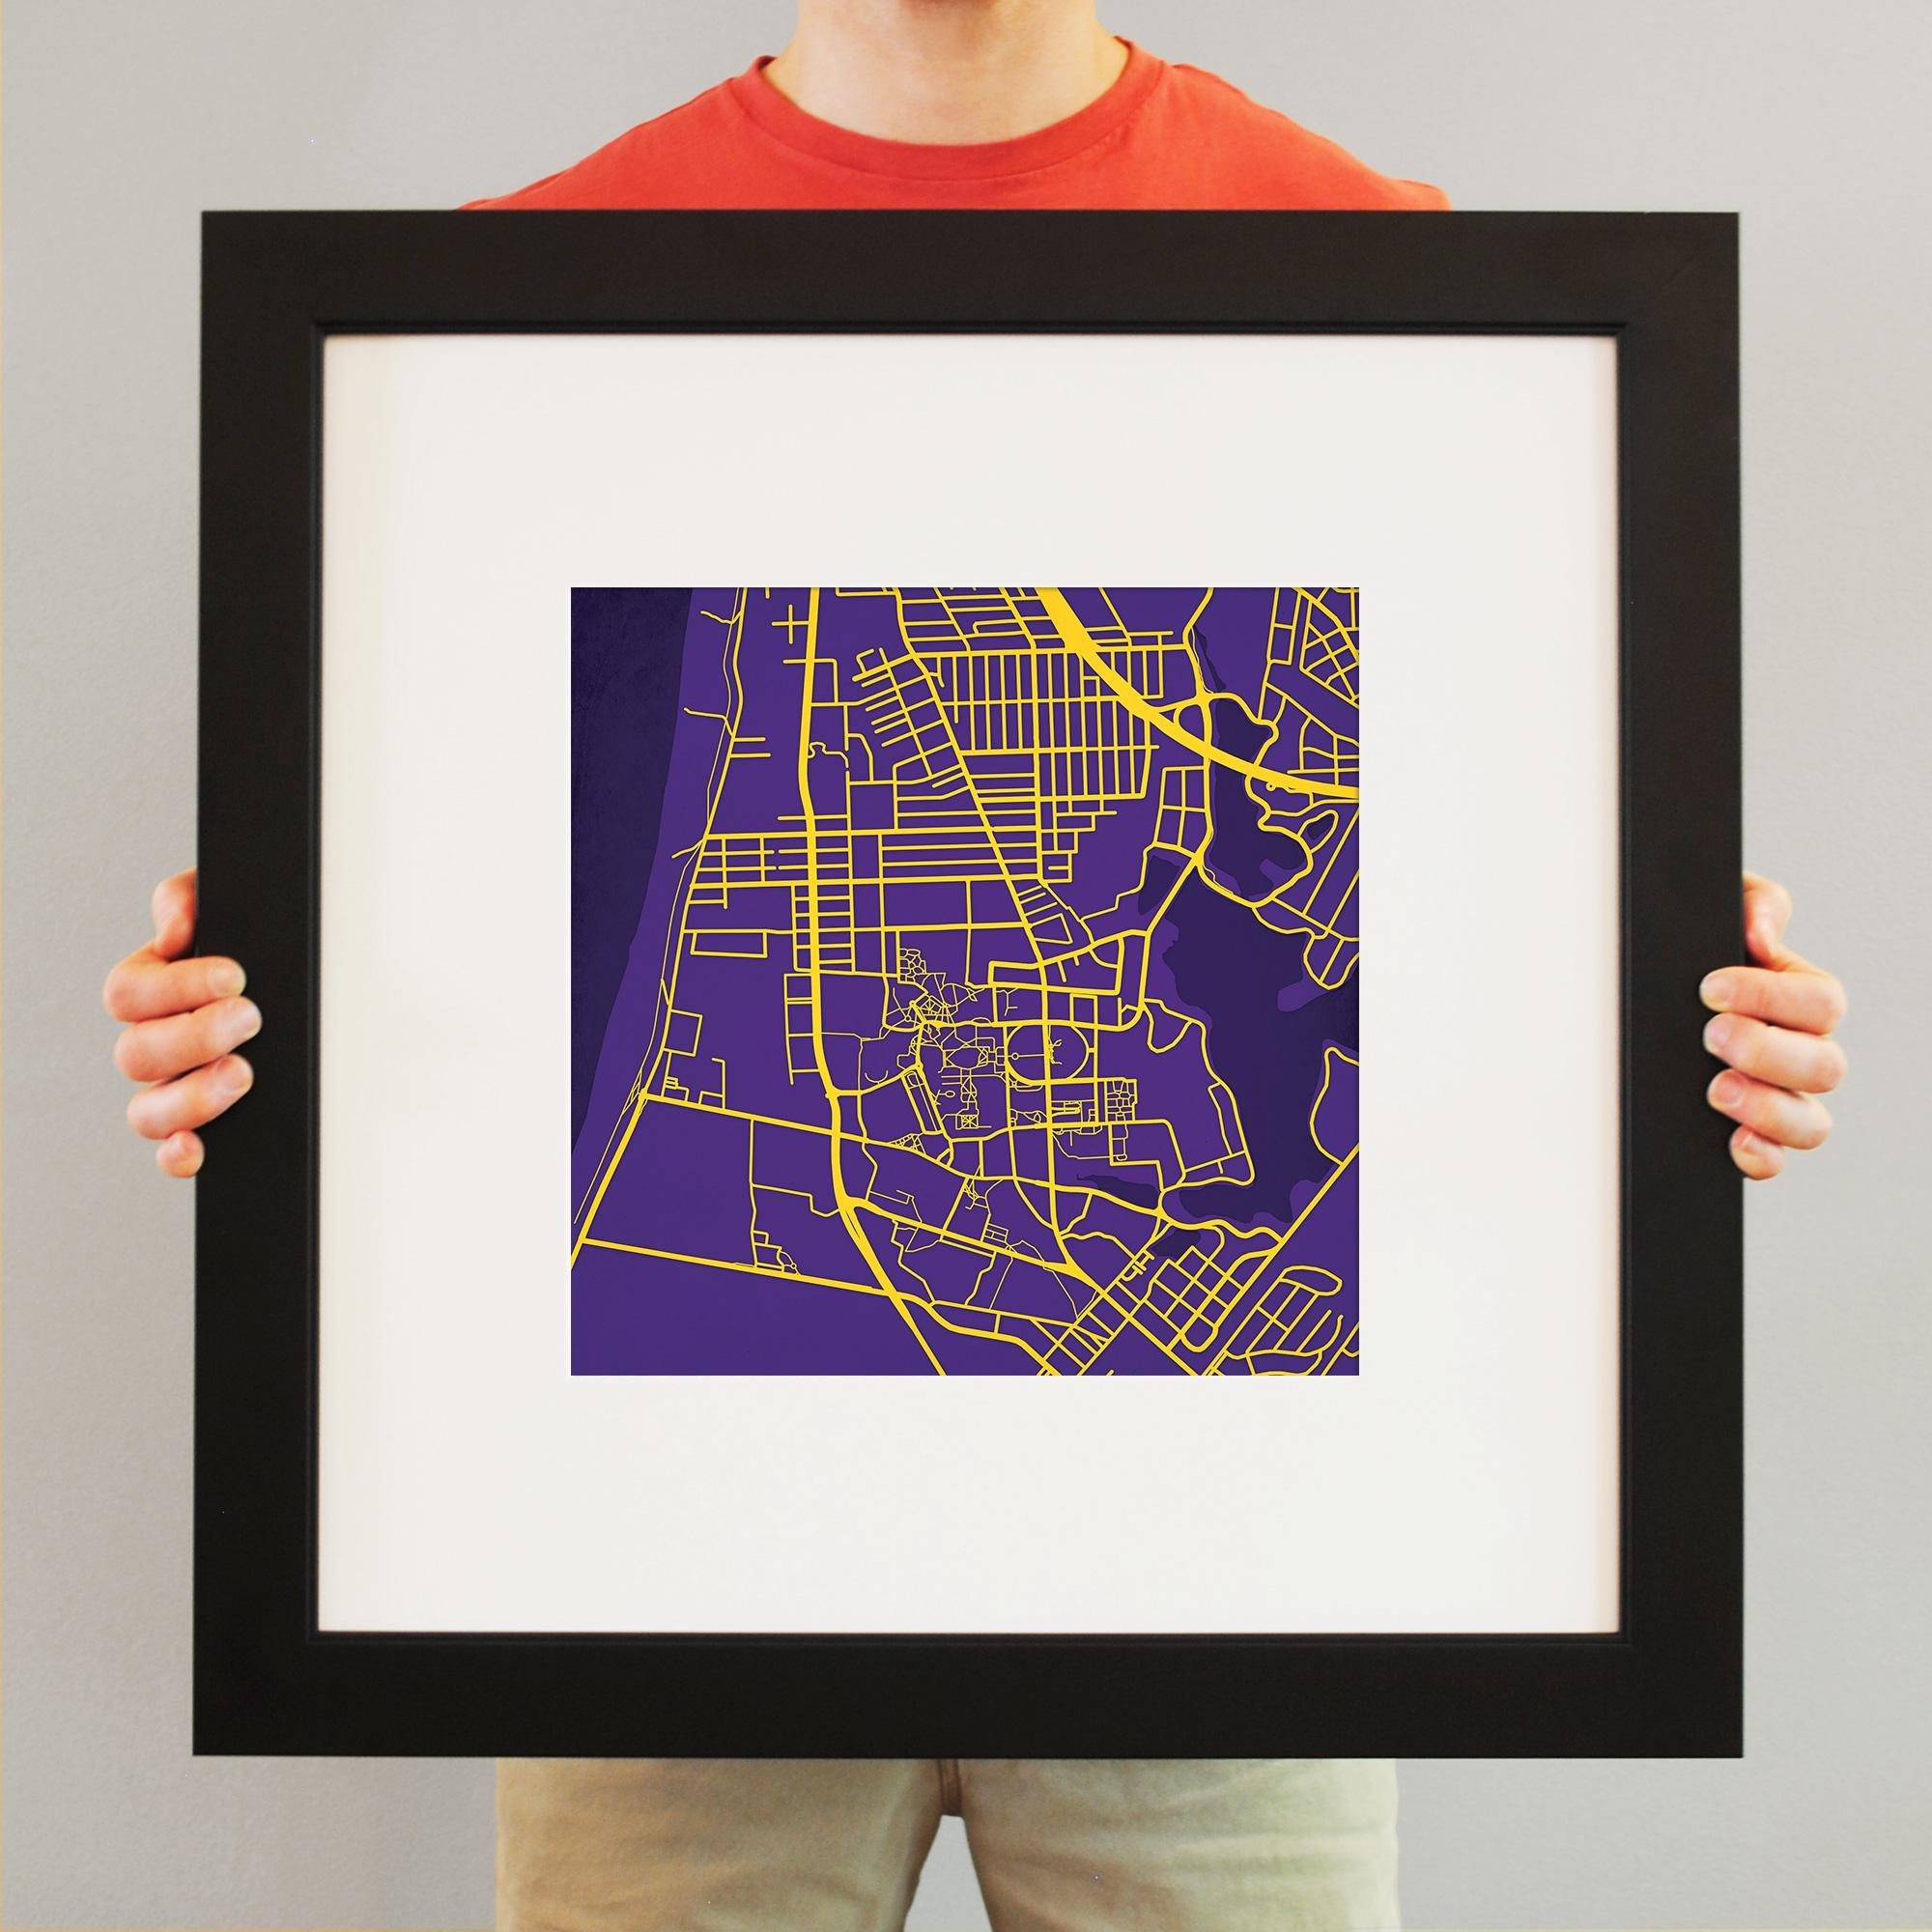 Louisiana State University Campus Map Art – City Prints With Lsu Wall Art (Image 8 of 20)